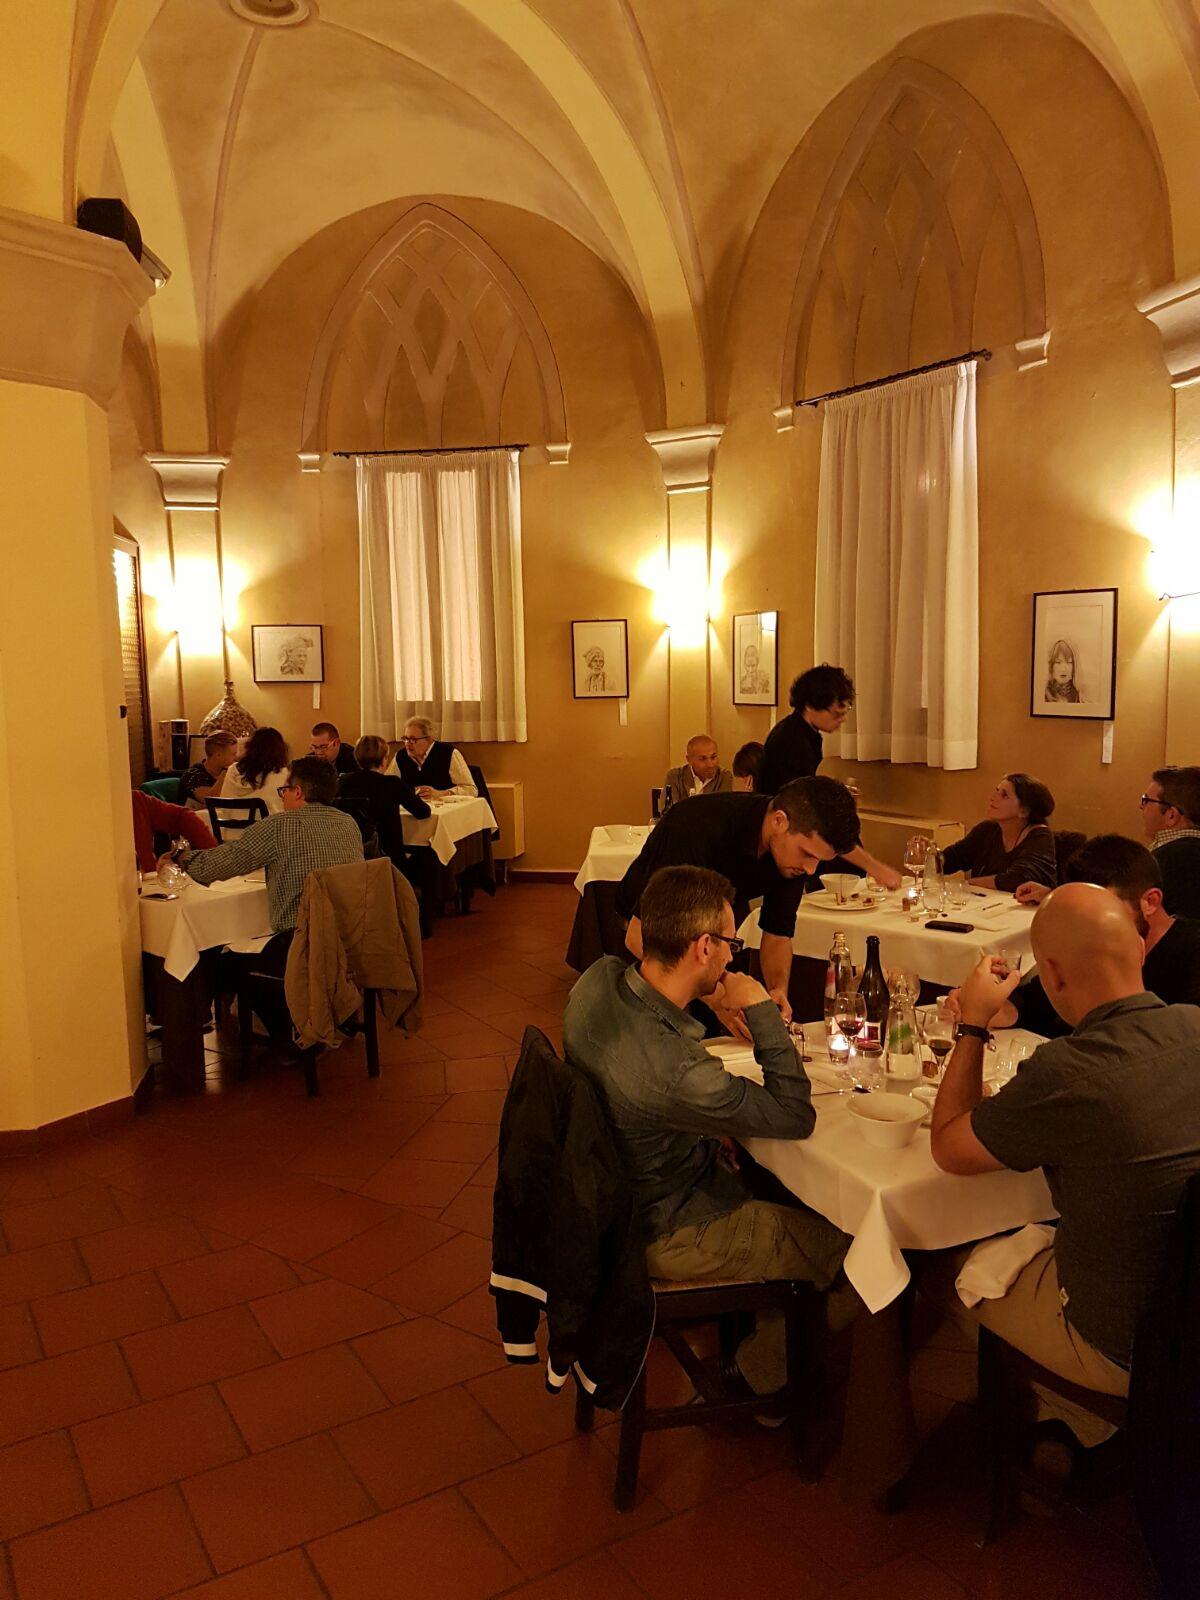 ristorante-badesse-sala-centrale